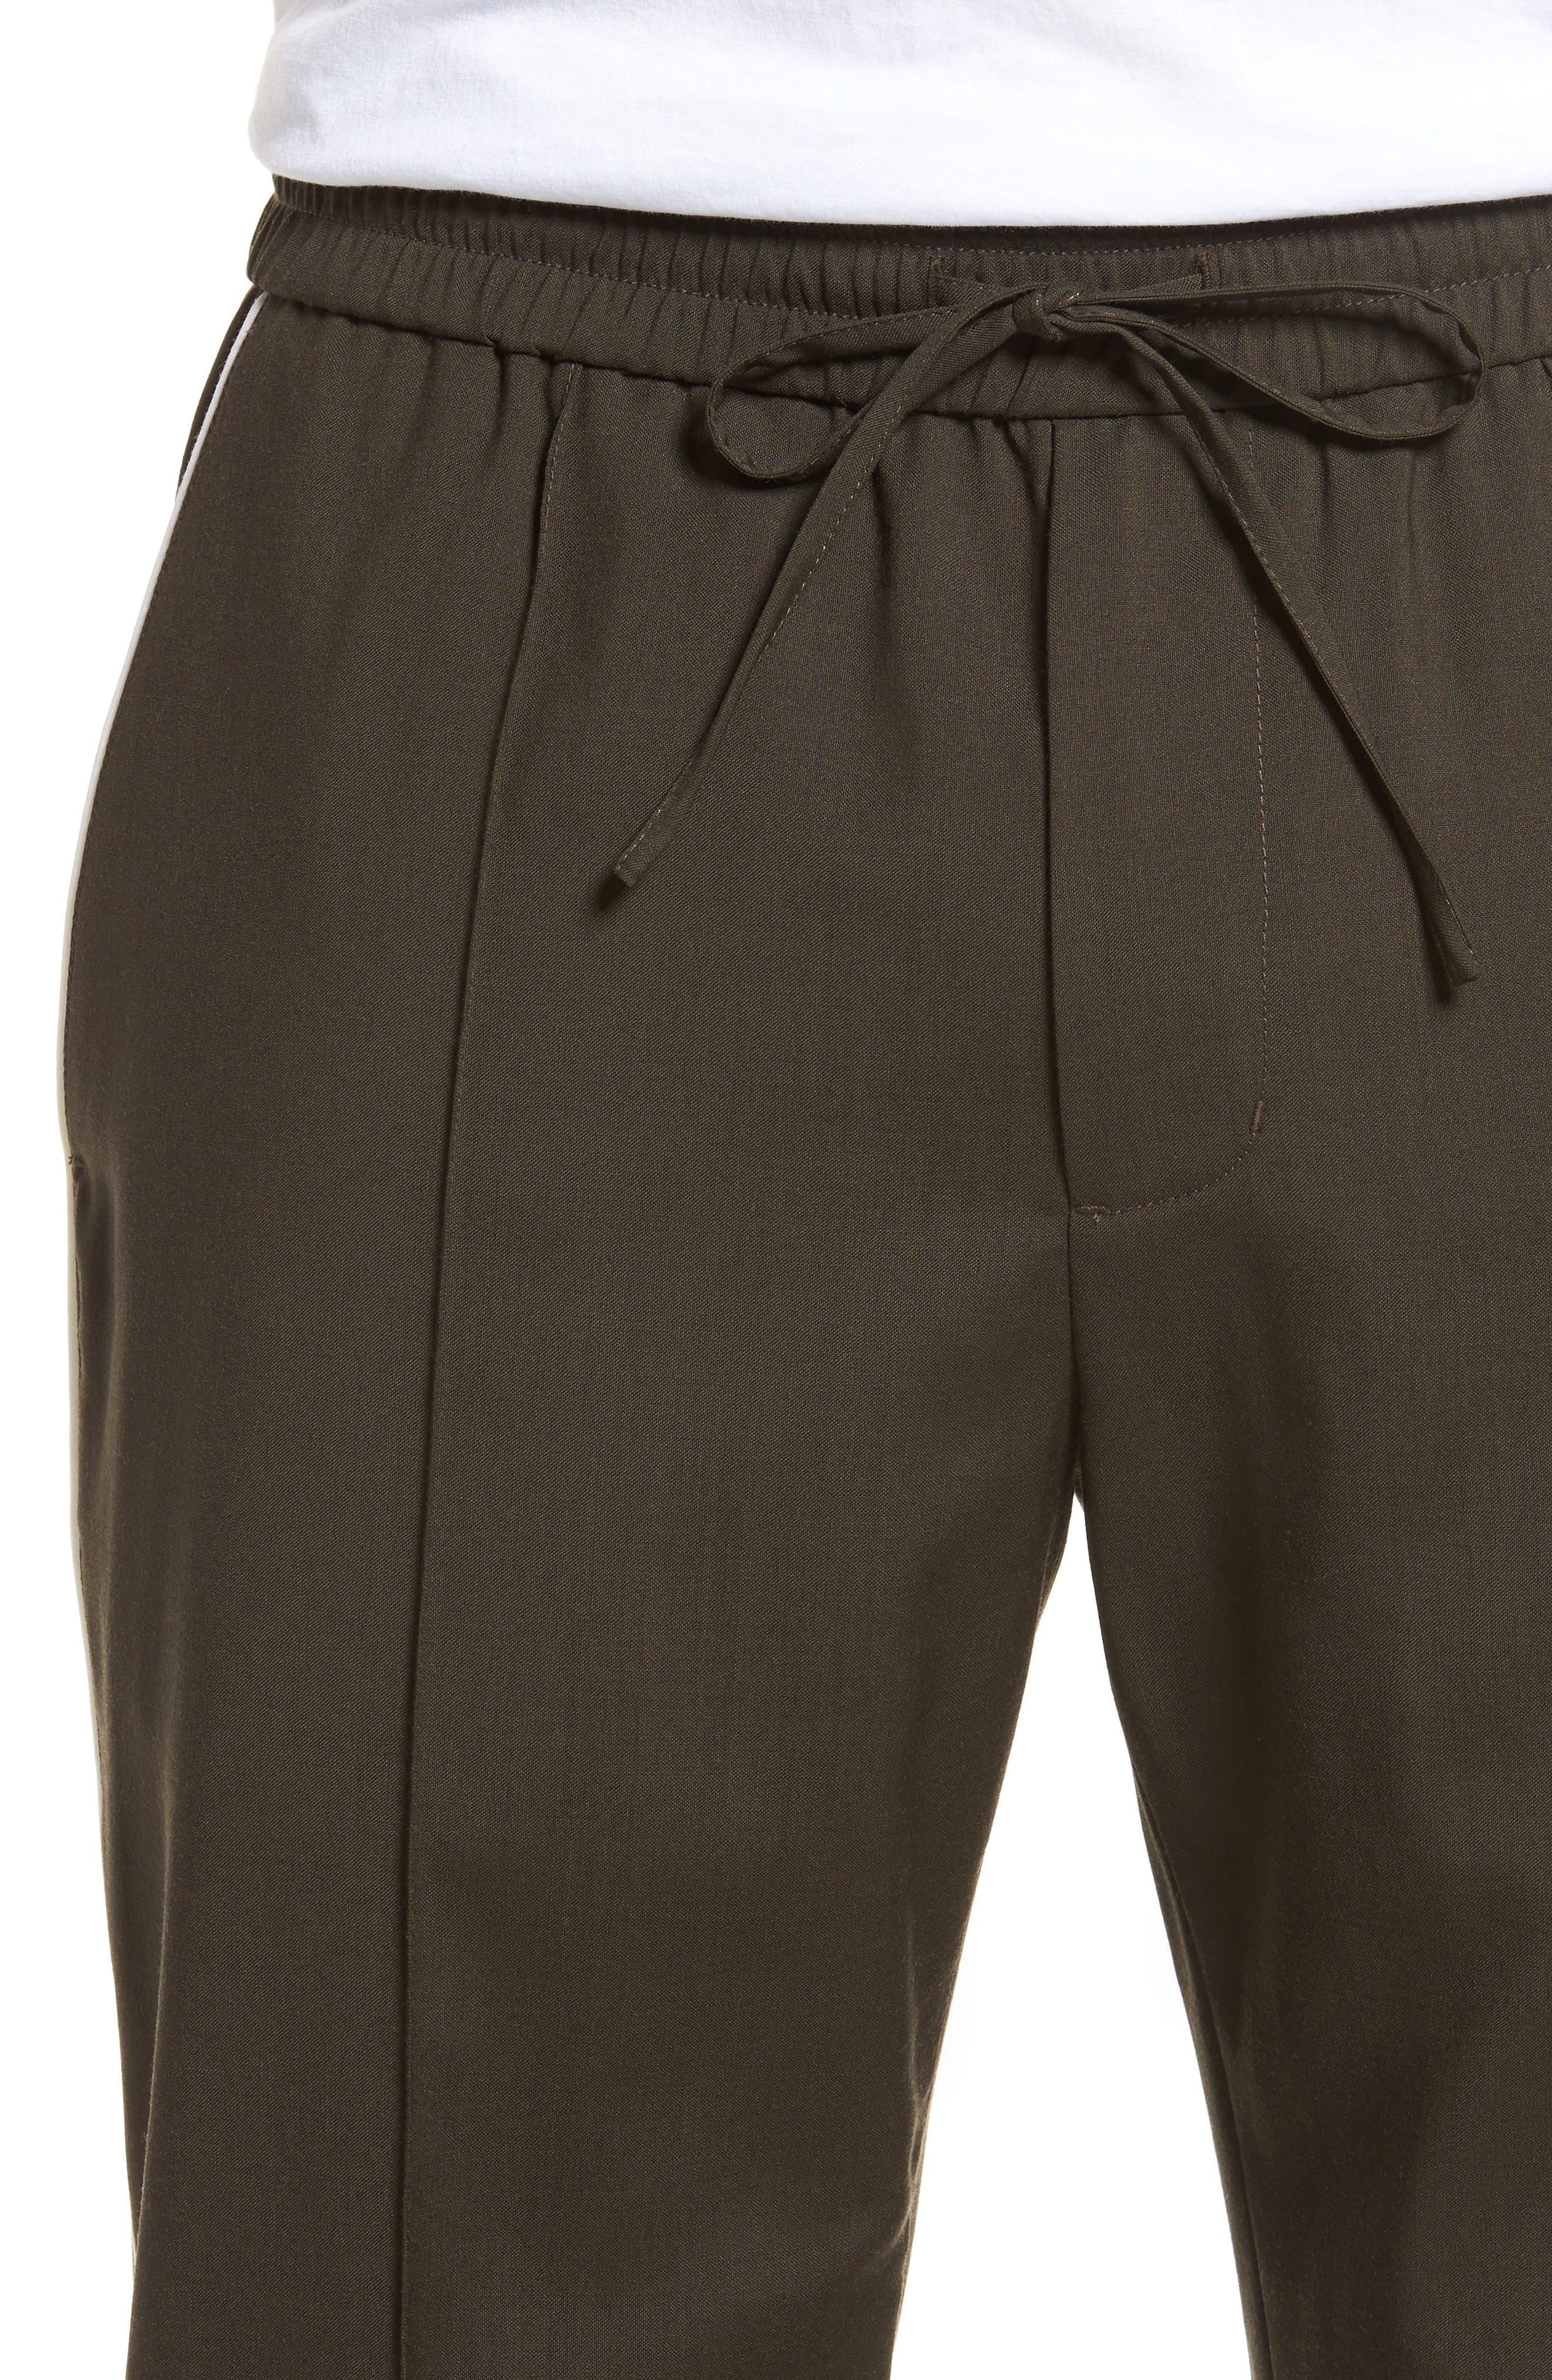 Regular Fit Track Pants,                             Alternate thumbnail 8, color,